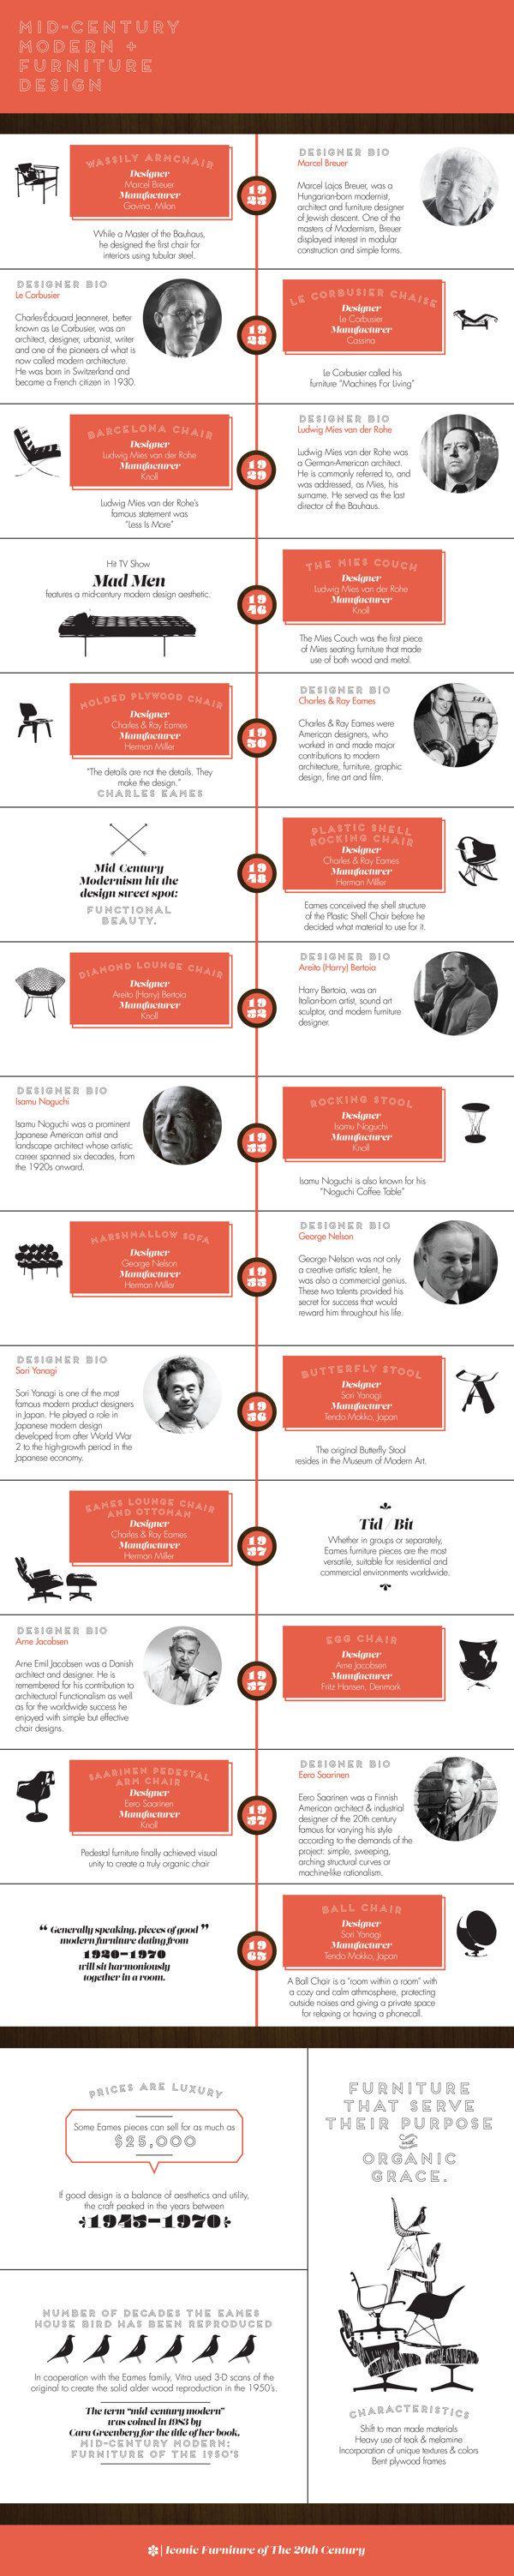 Mid-Century Modern Furniture Infographic by Janessa Rae VanOeffelen, via Behance